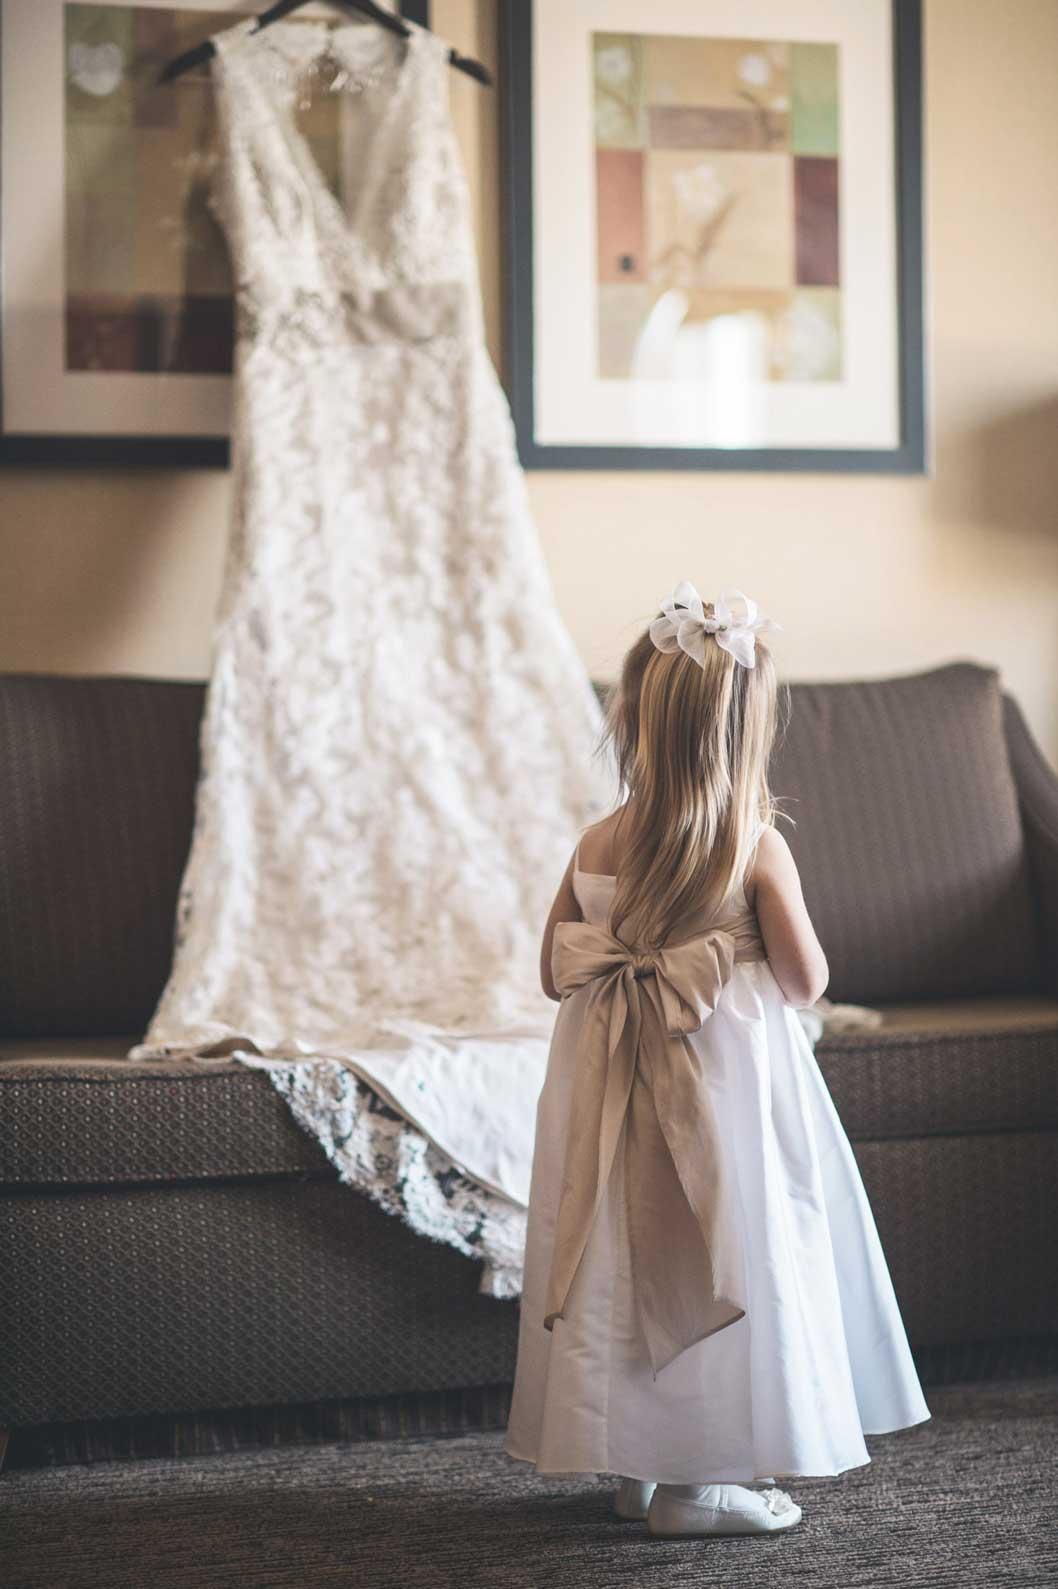 Flower girl looking at bride's dress